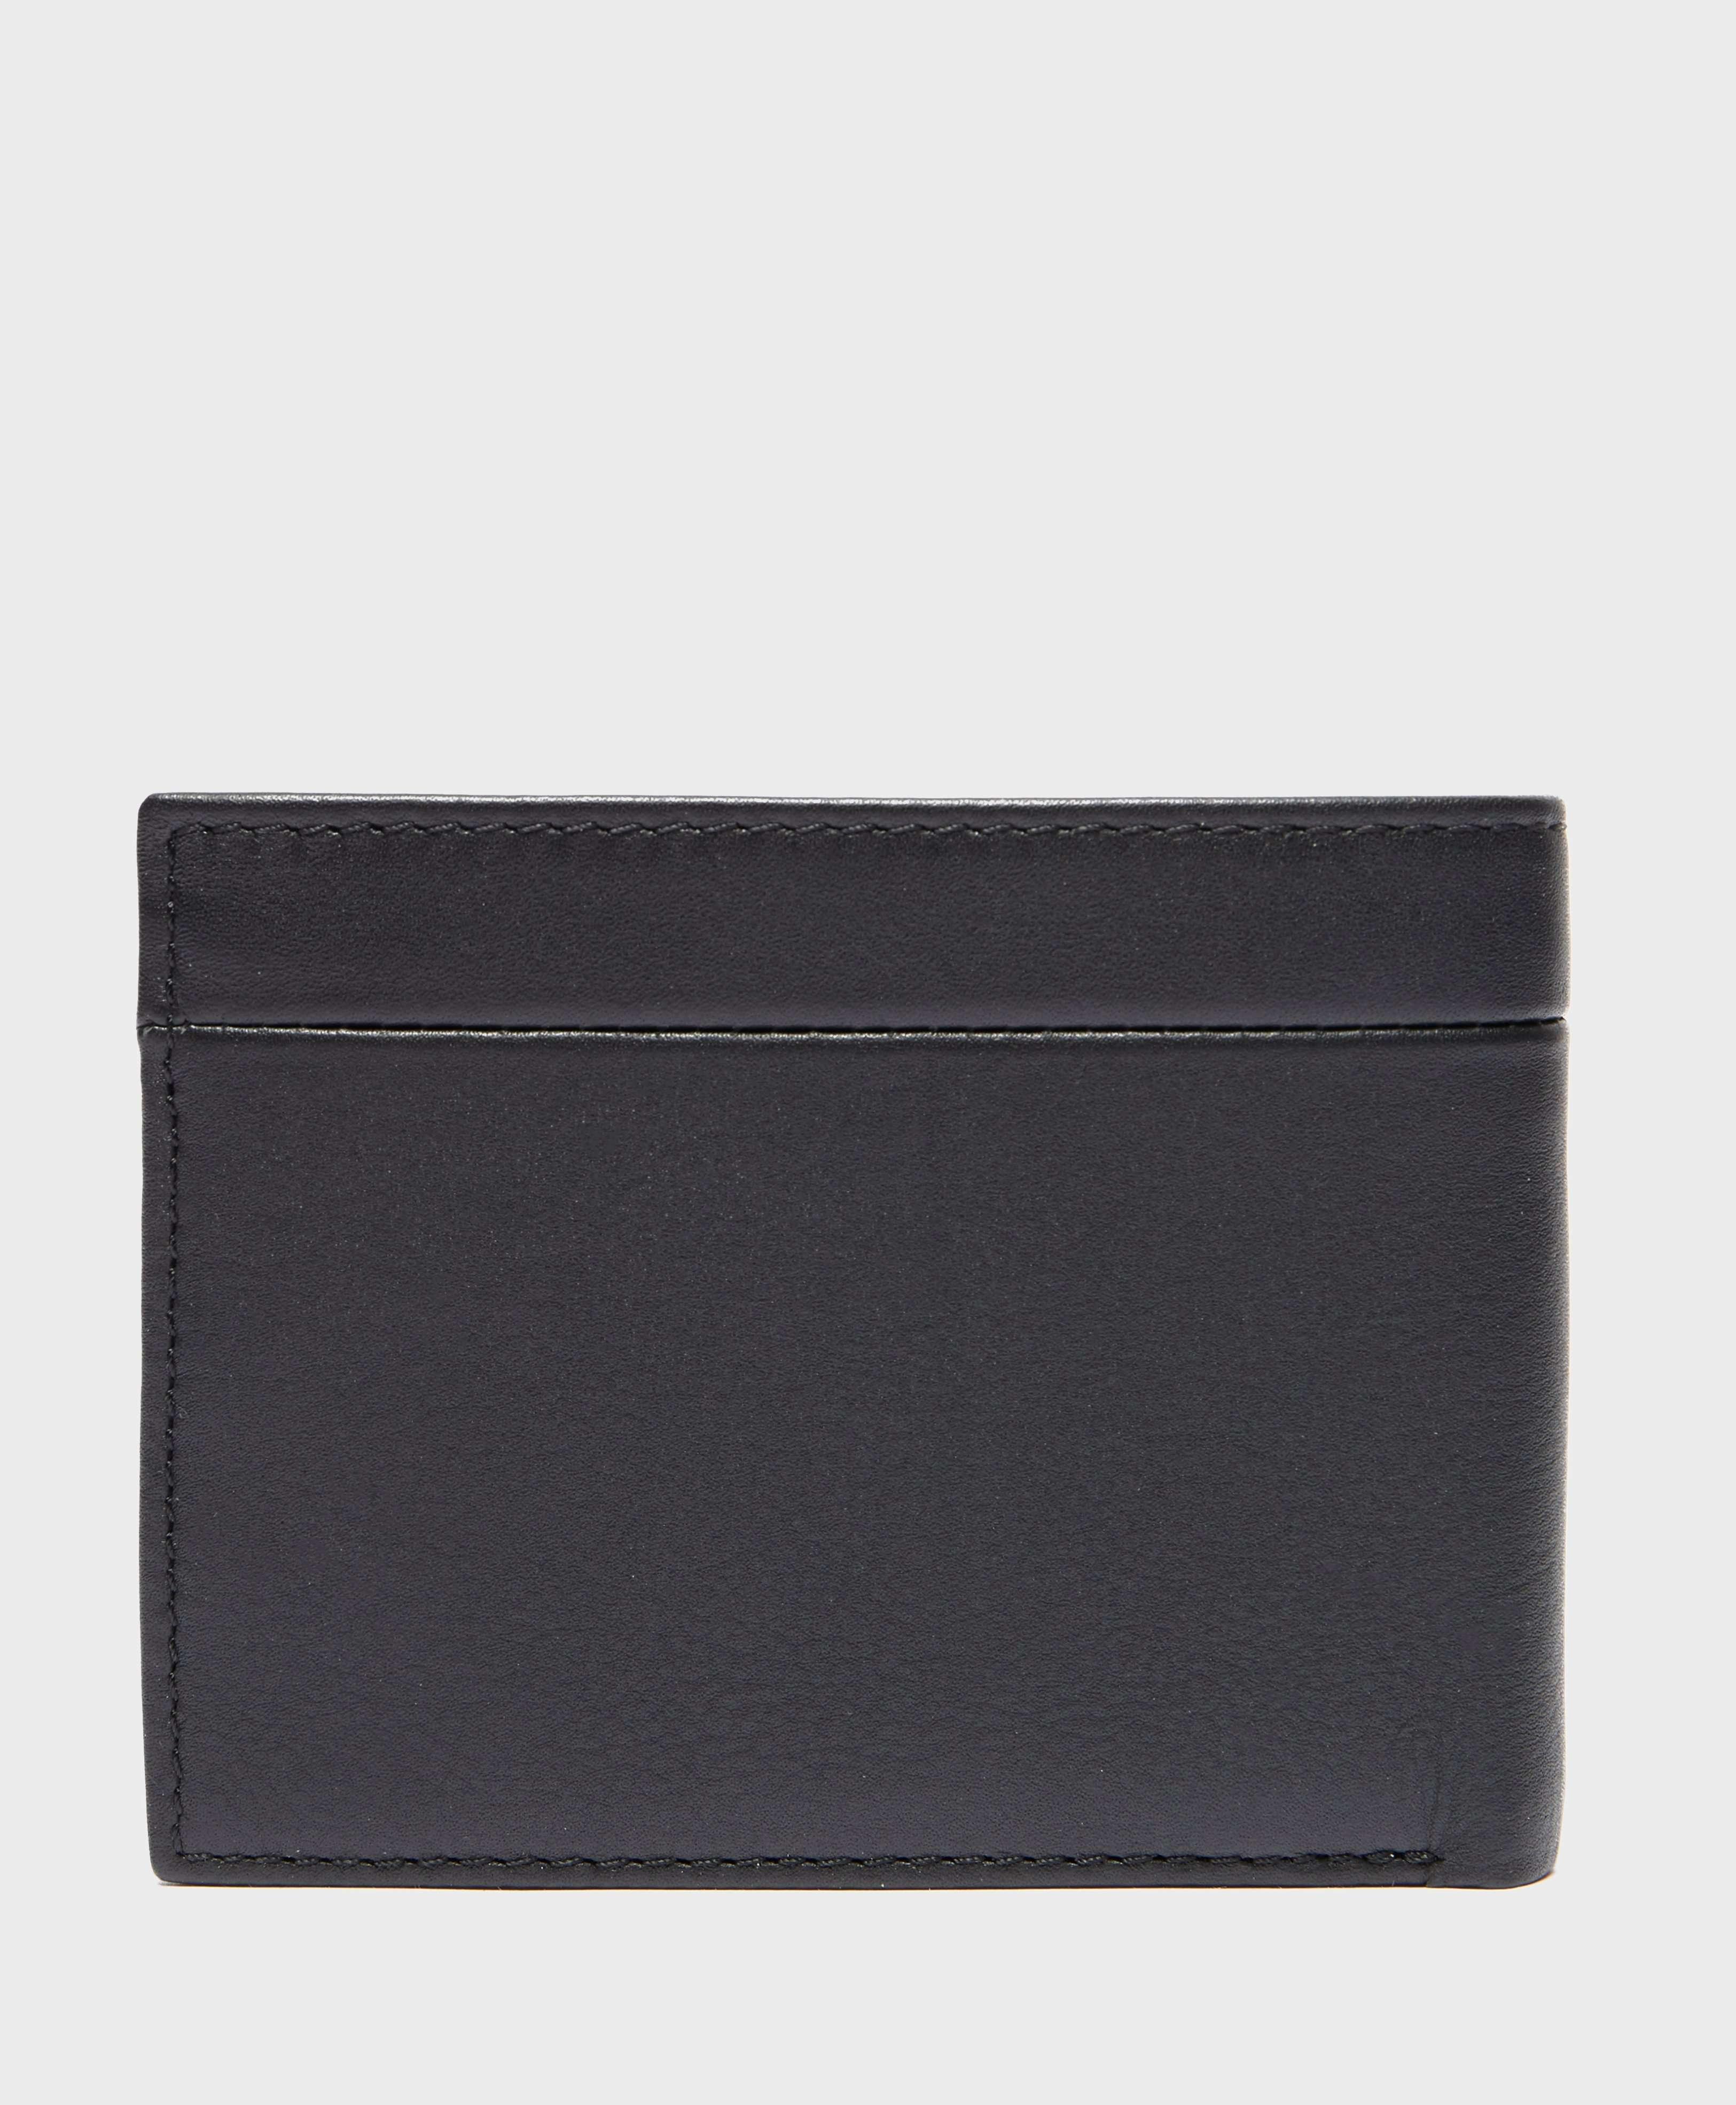 Versace Jeans Leather Wallet - Online Exclusive